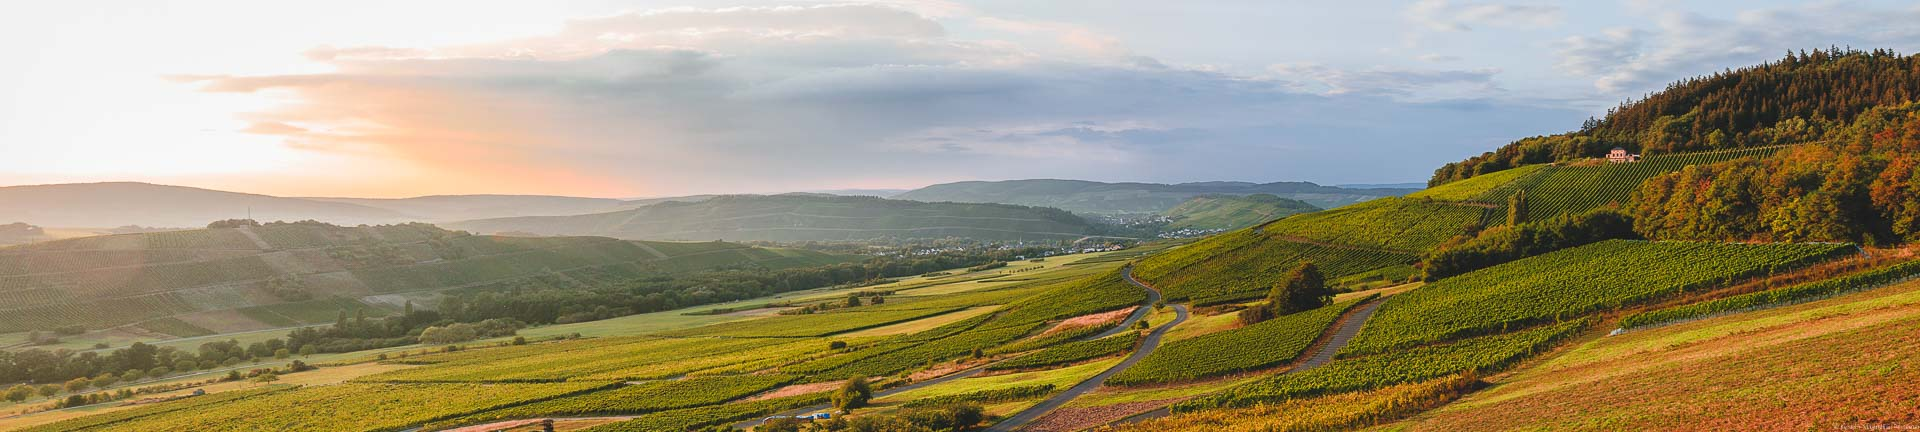 Sonnenuntergang vor den Mosel-Weinbergen der Grafschaft Veldenz